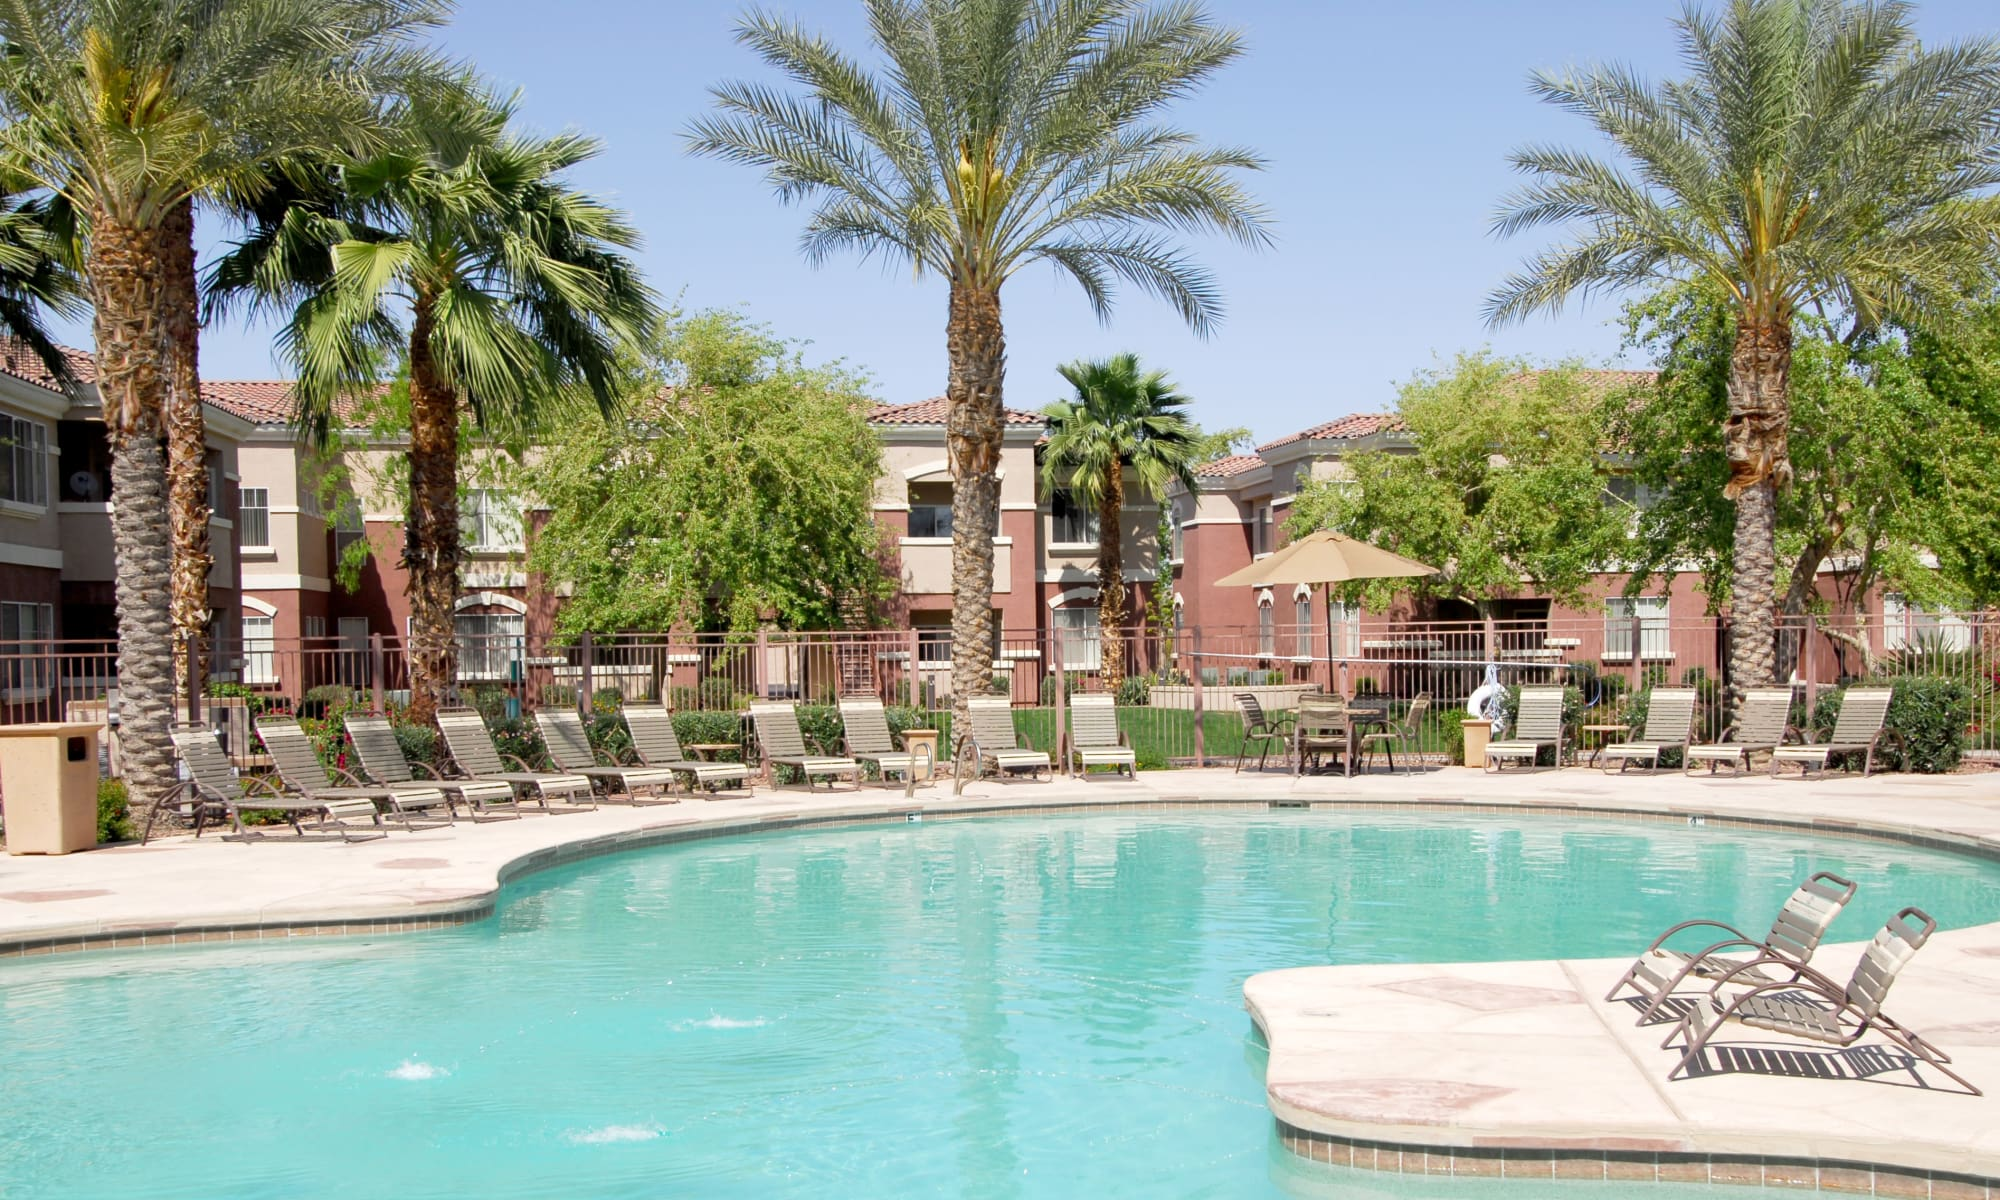 Remington Ranch Apartments in Litchfield Park, Arizona